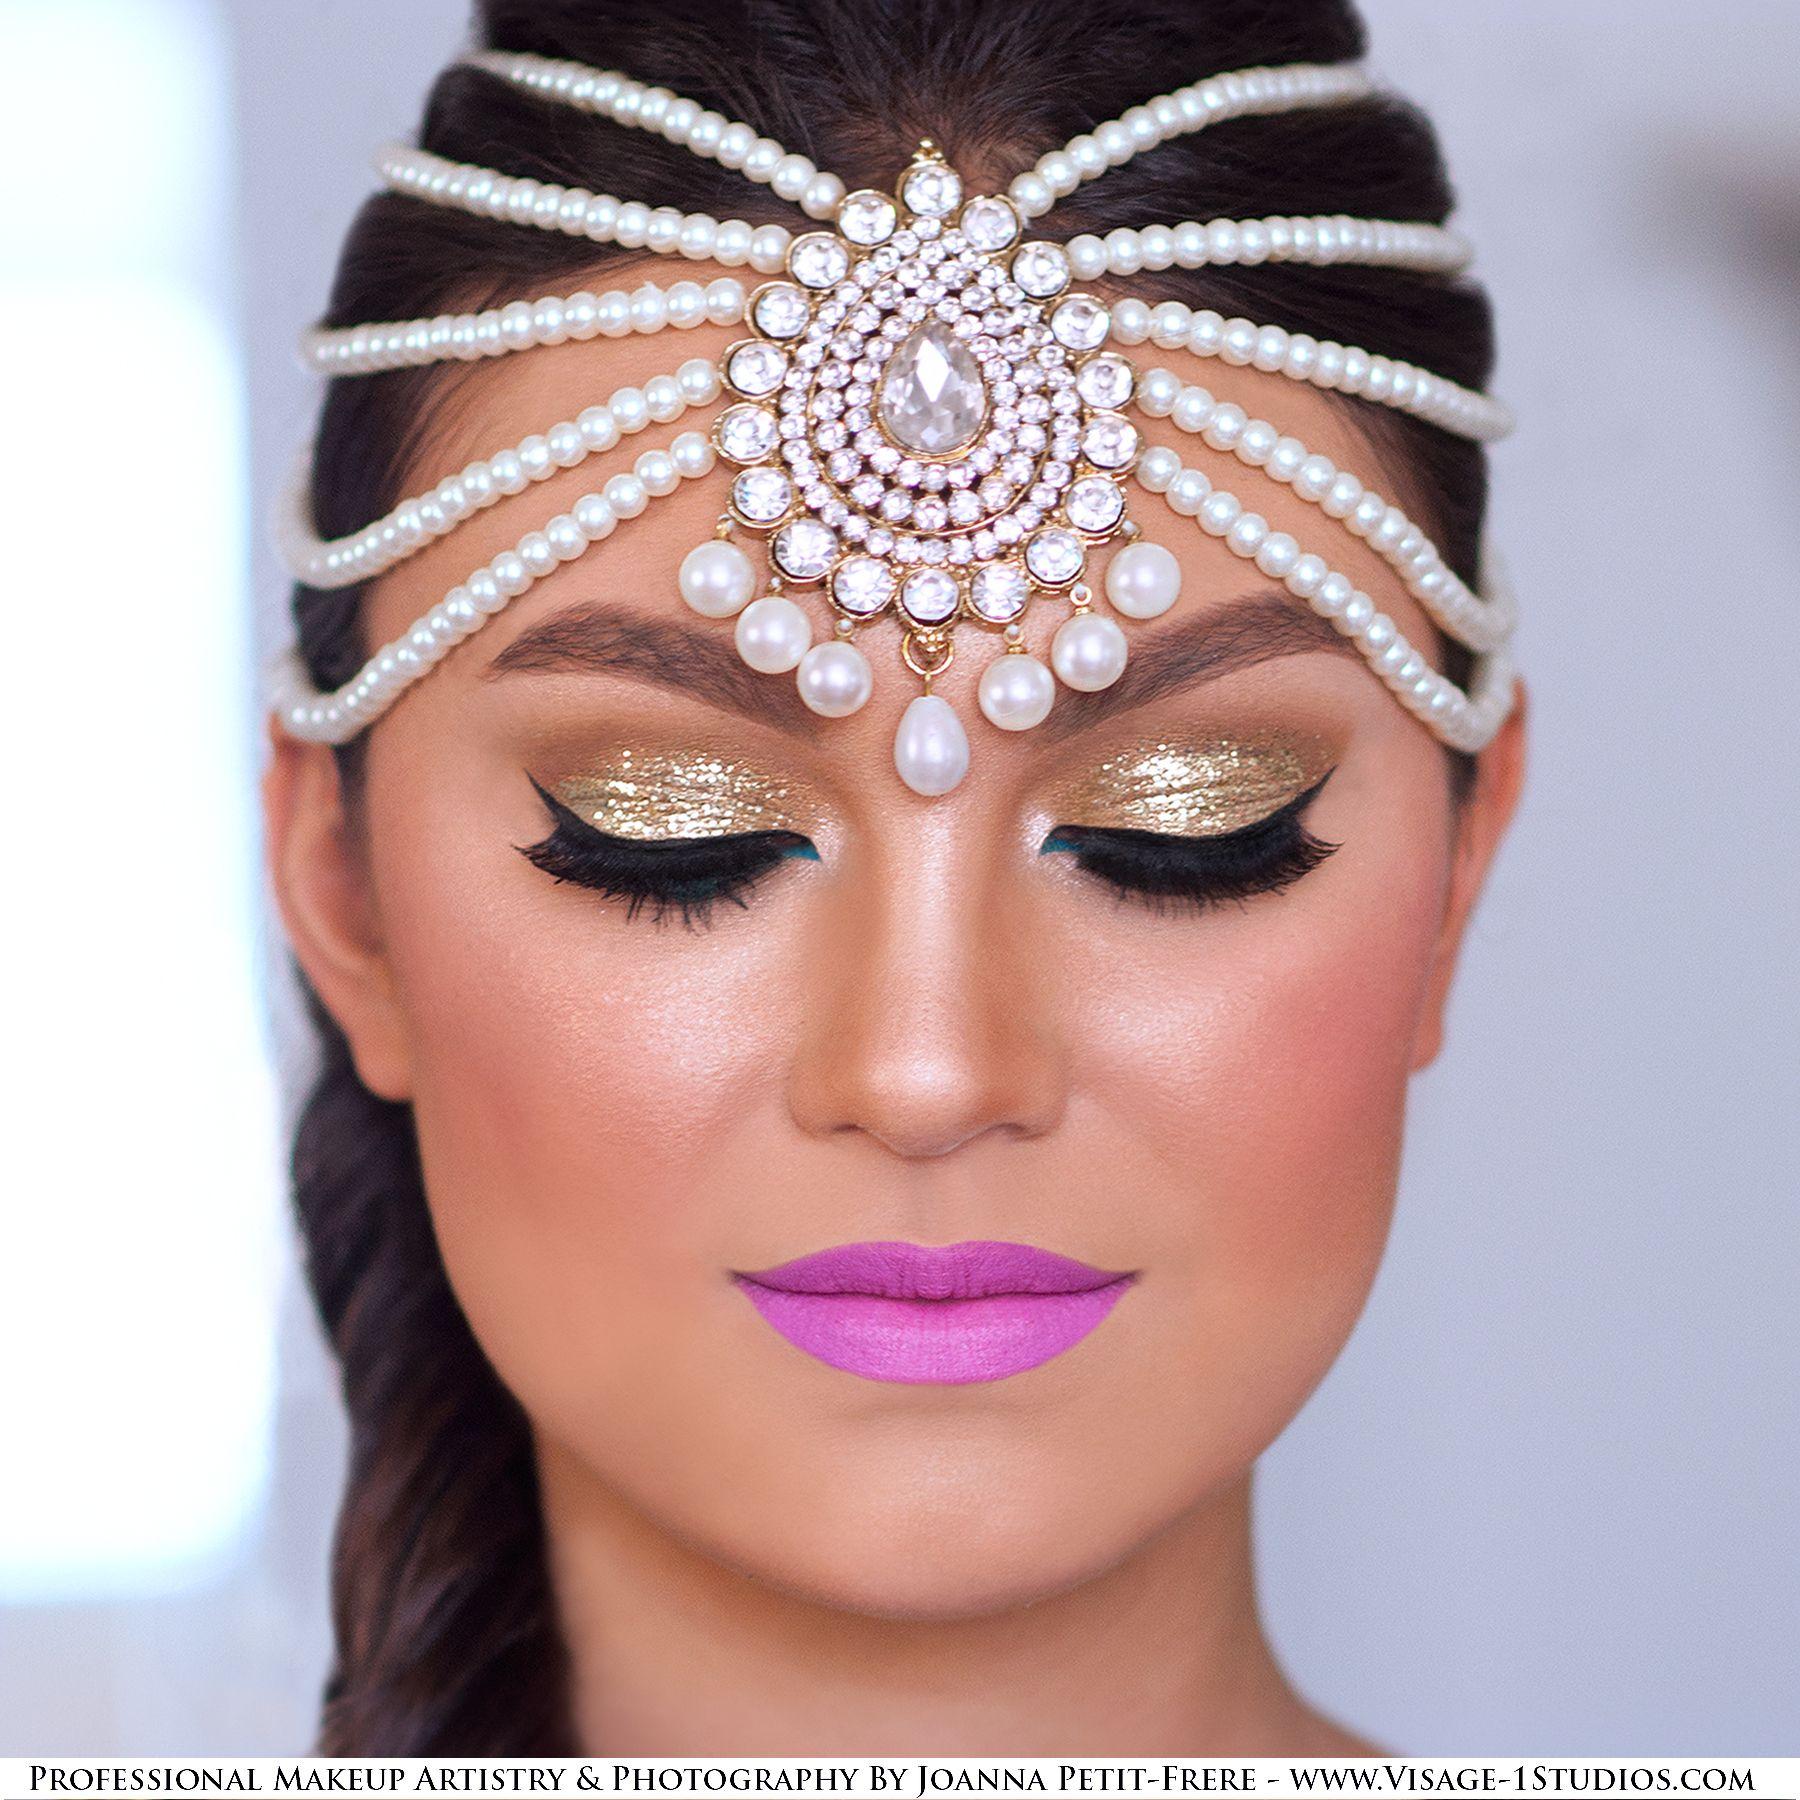 #BostonMakeupArtist #BostonmakeupArtistandPhotographer #bostonindianwedding #JoannaPetitFrere #internationalbeautybrides #Visage1Studios #contourmakeup #glittereyeshadow #strobingmakeup #highlightmakeup  #PakistaniWeddingMakeup #BostonIndianBridalMakeupArtist  #punjabibridalmakeup #bostonwedding #Indianfashion #brocadesboutique #indianbridalmakeup #indianbridalheadjewerly #bridalheadpiece #indianbride #Punjabigiddhamakeup #Indianfashion #indianbridaljewerly #goldeyeshadow